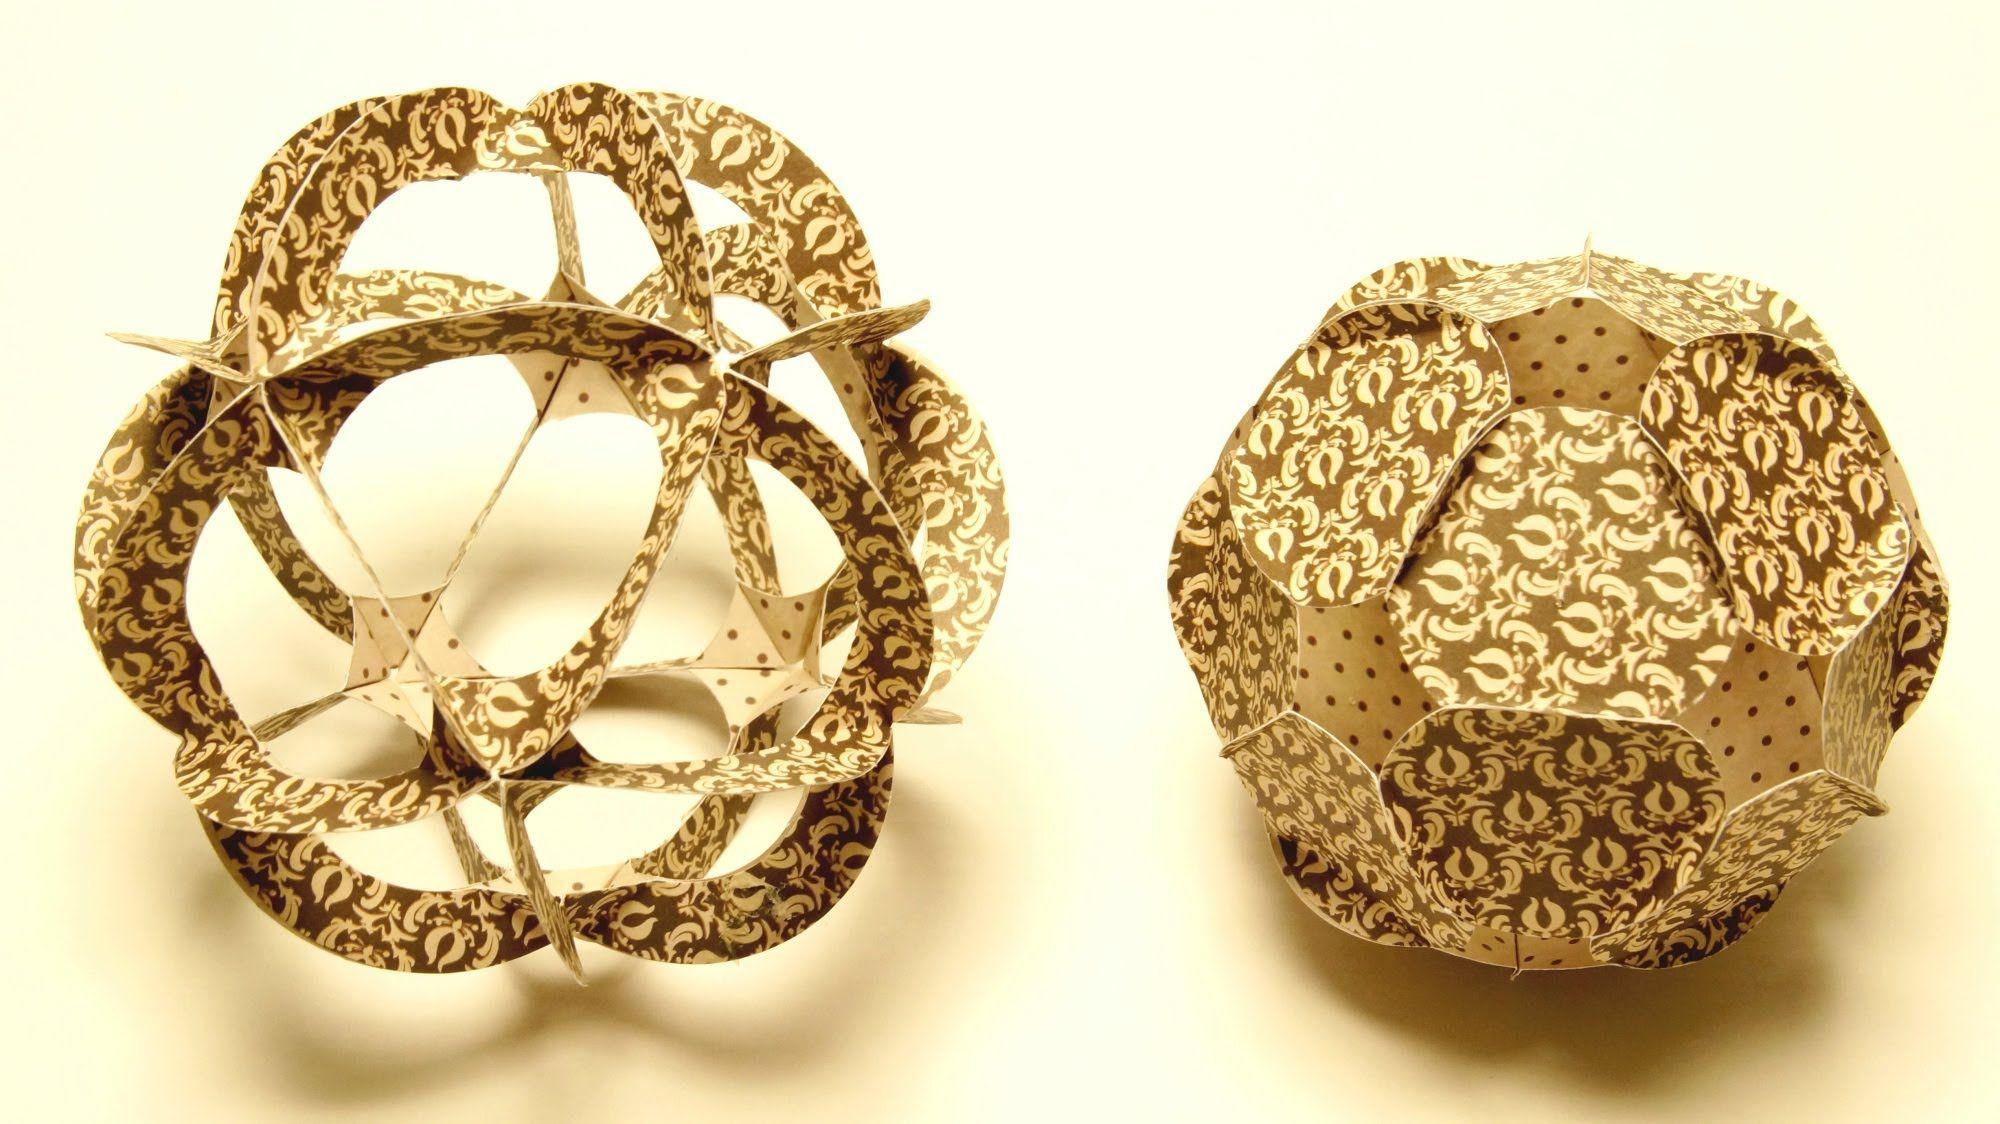 Basteln mit Papier: Paper Ball basteln aus Papier-Ornamenten...